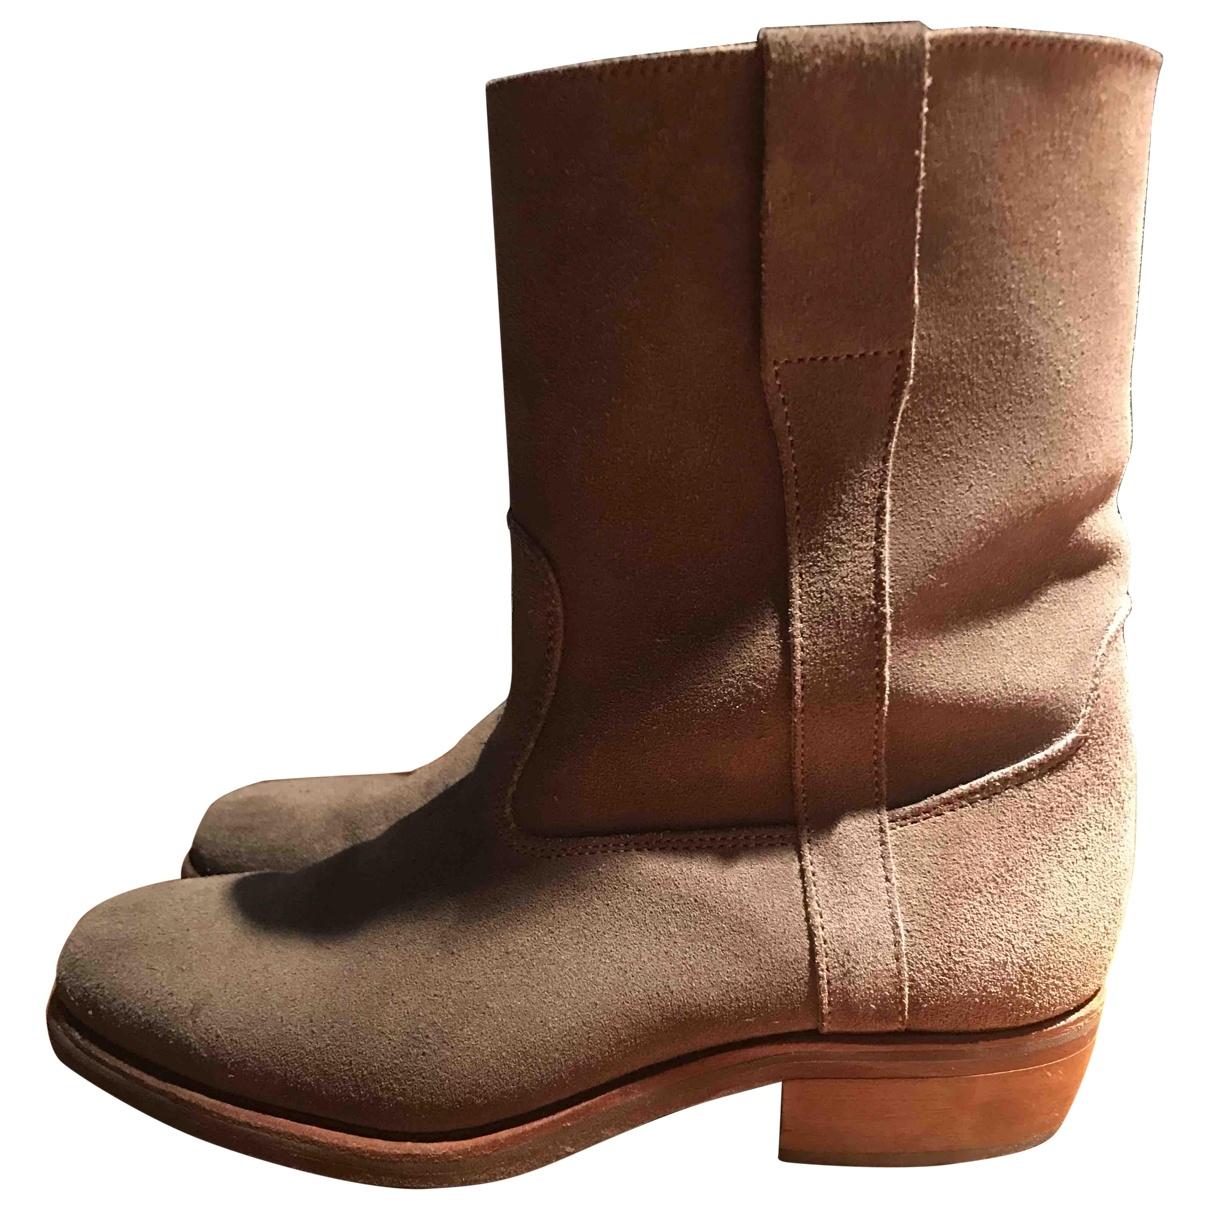 Odetta - Boots   pour femme en cuir - beige